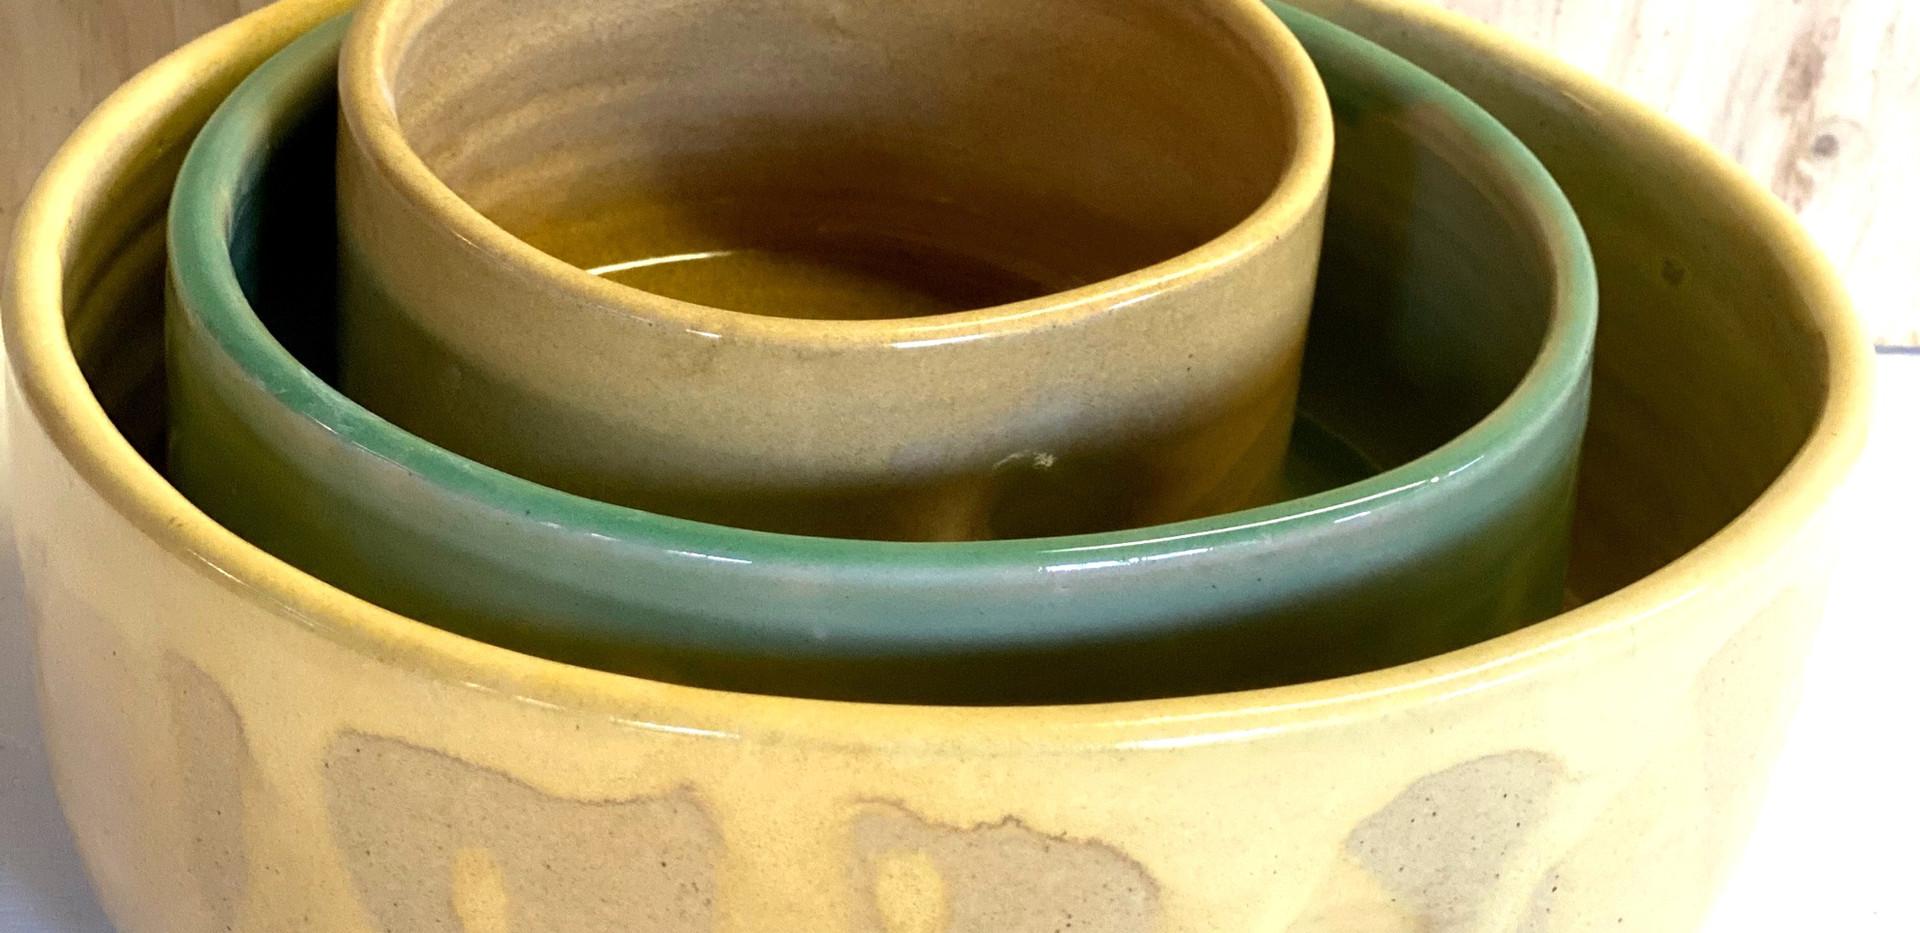 Nesting Bowls, set of 3